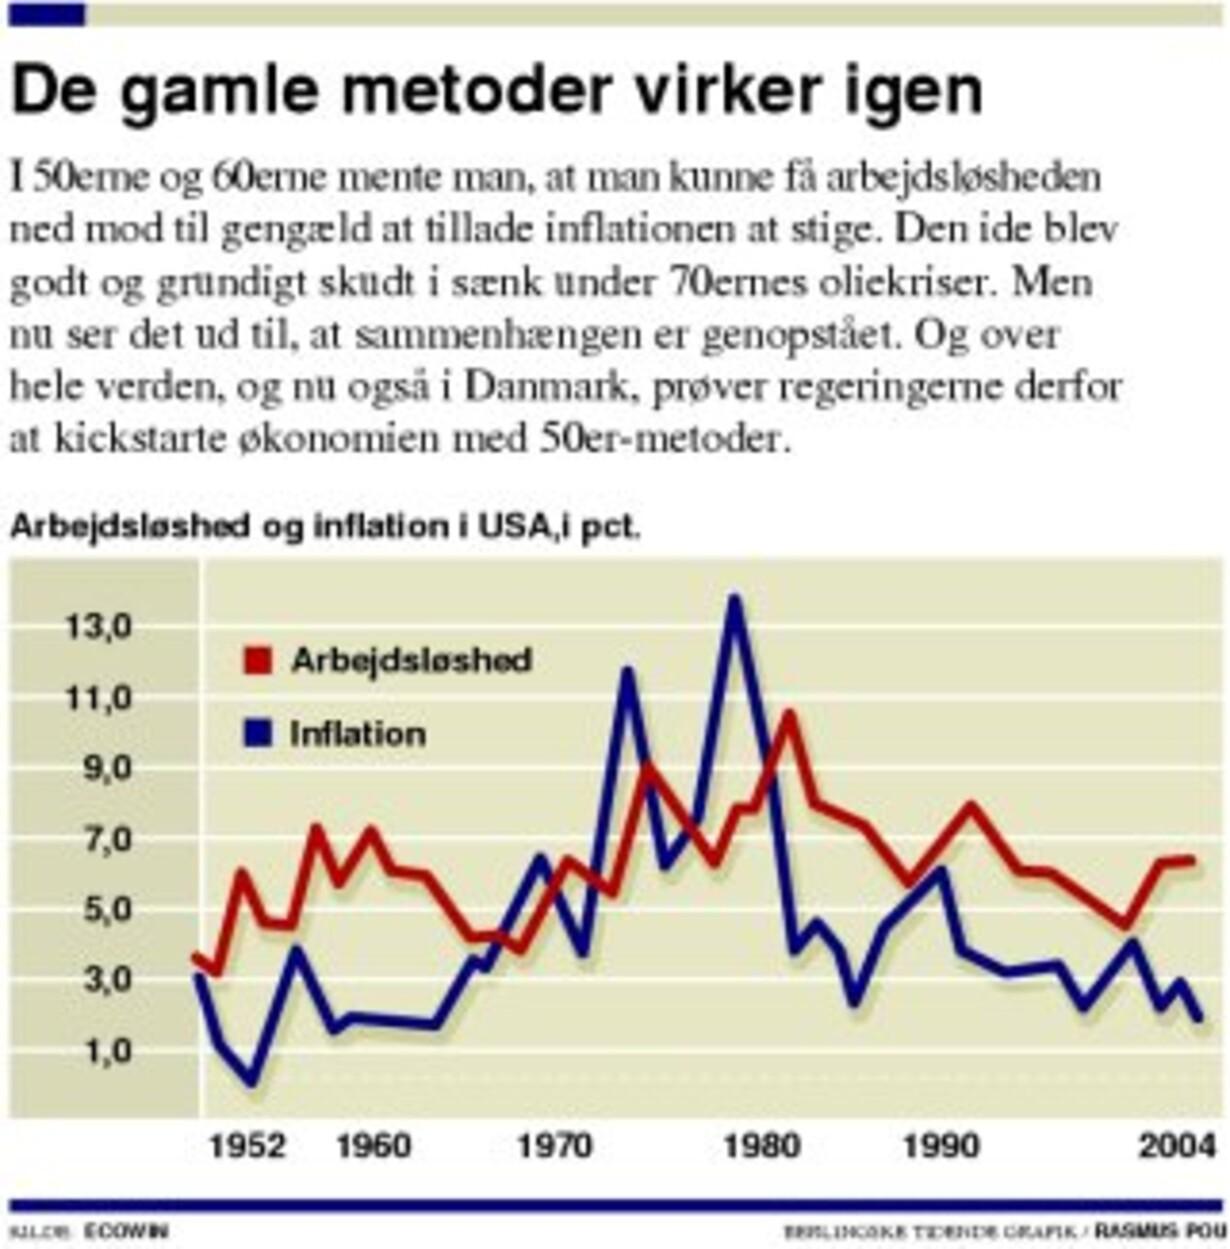 Den globale kickstarts-trend er nået til Danmark - 1